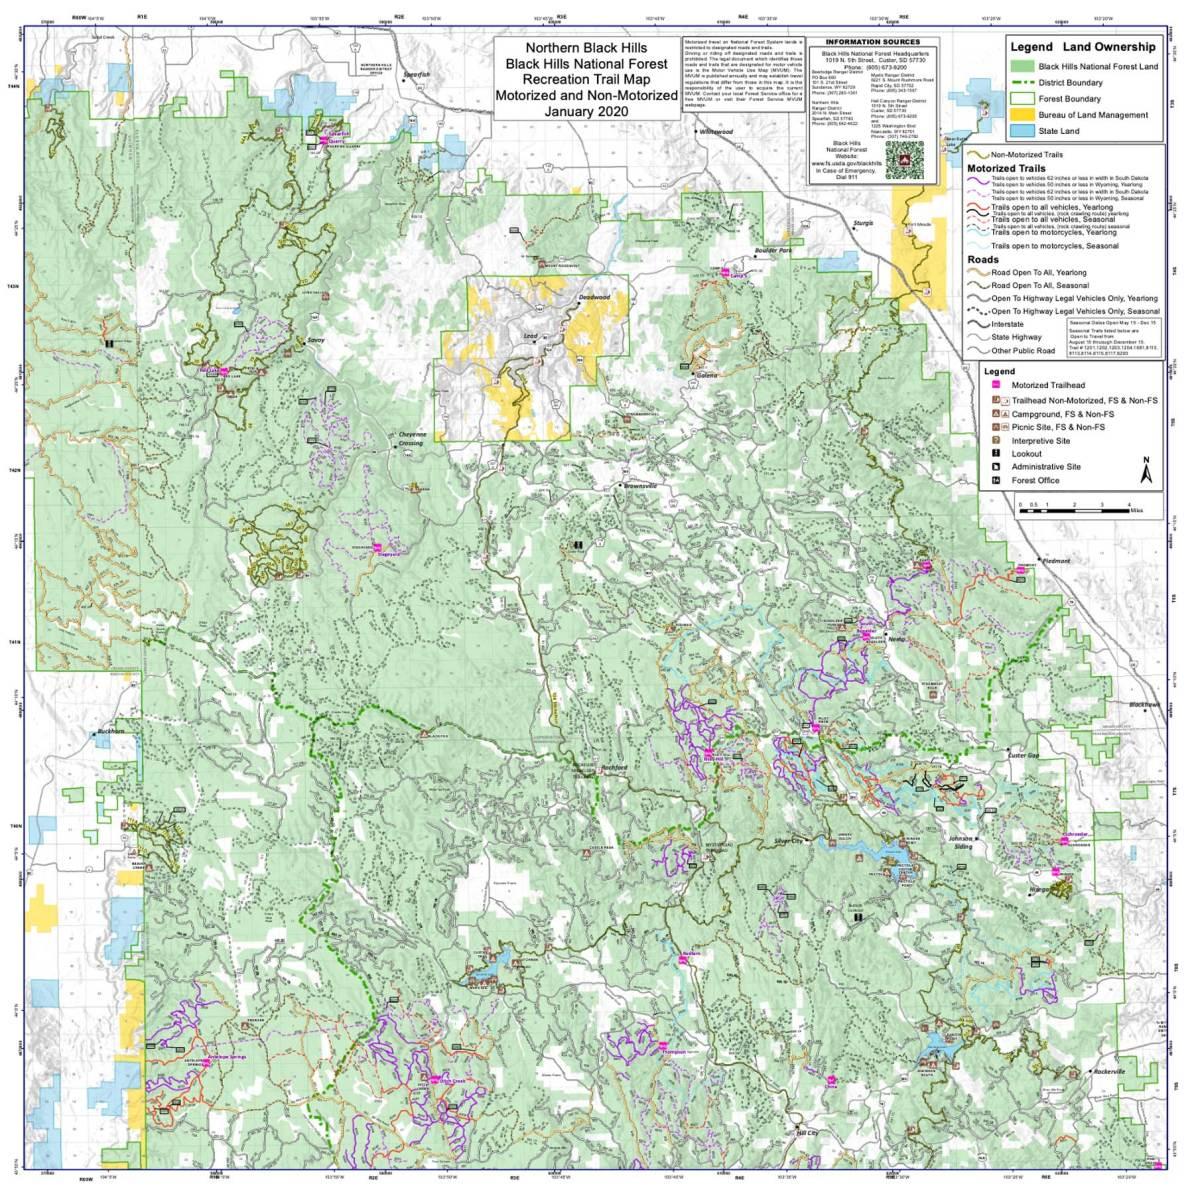 northern black hills ranger district map